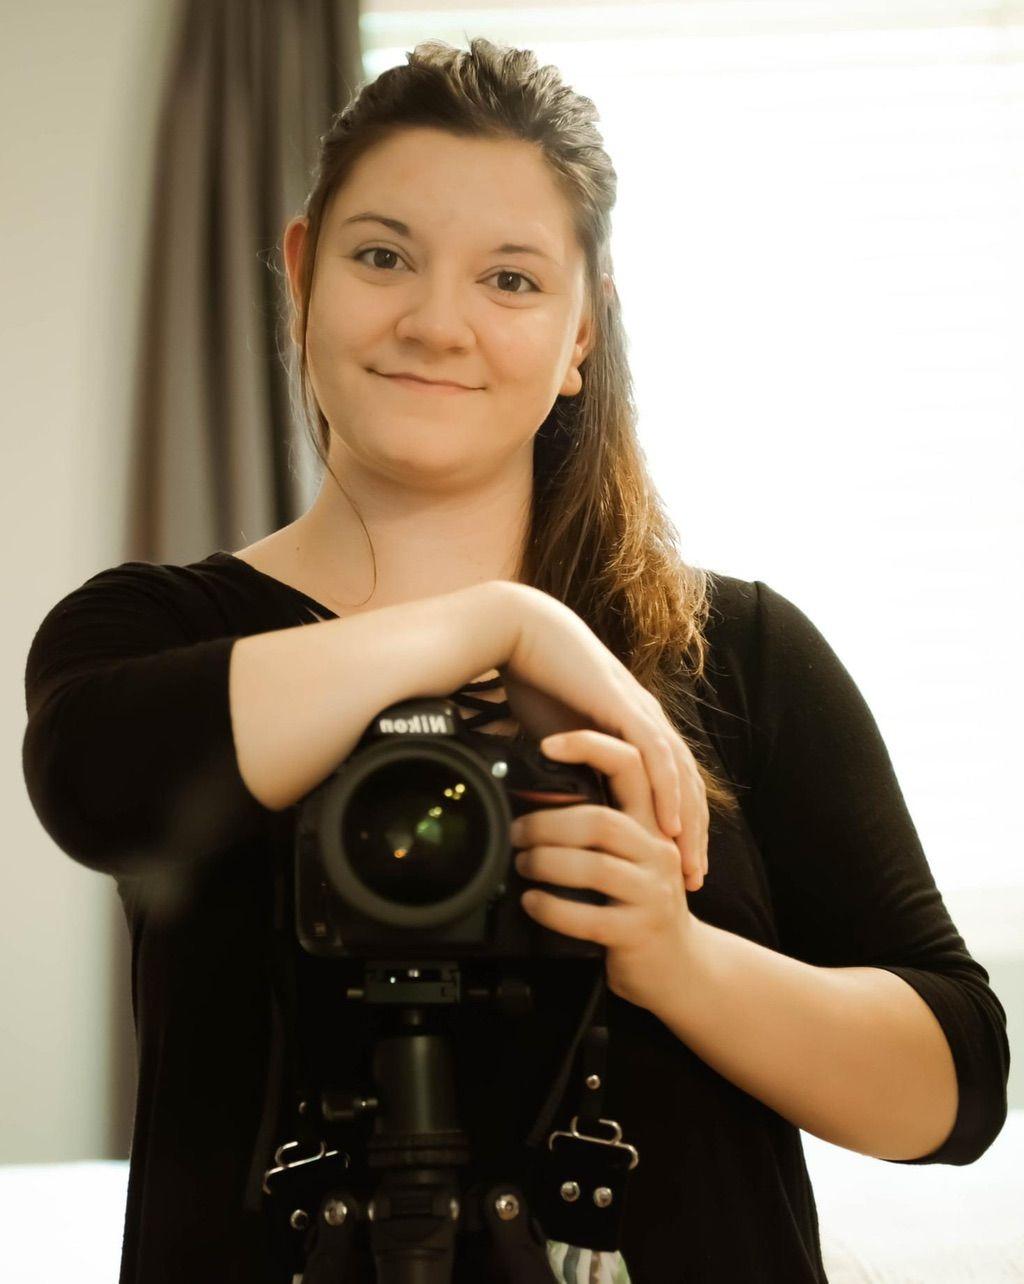 Lea Photography